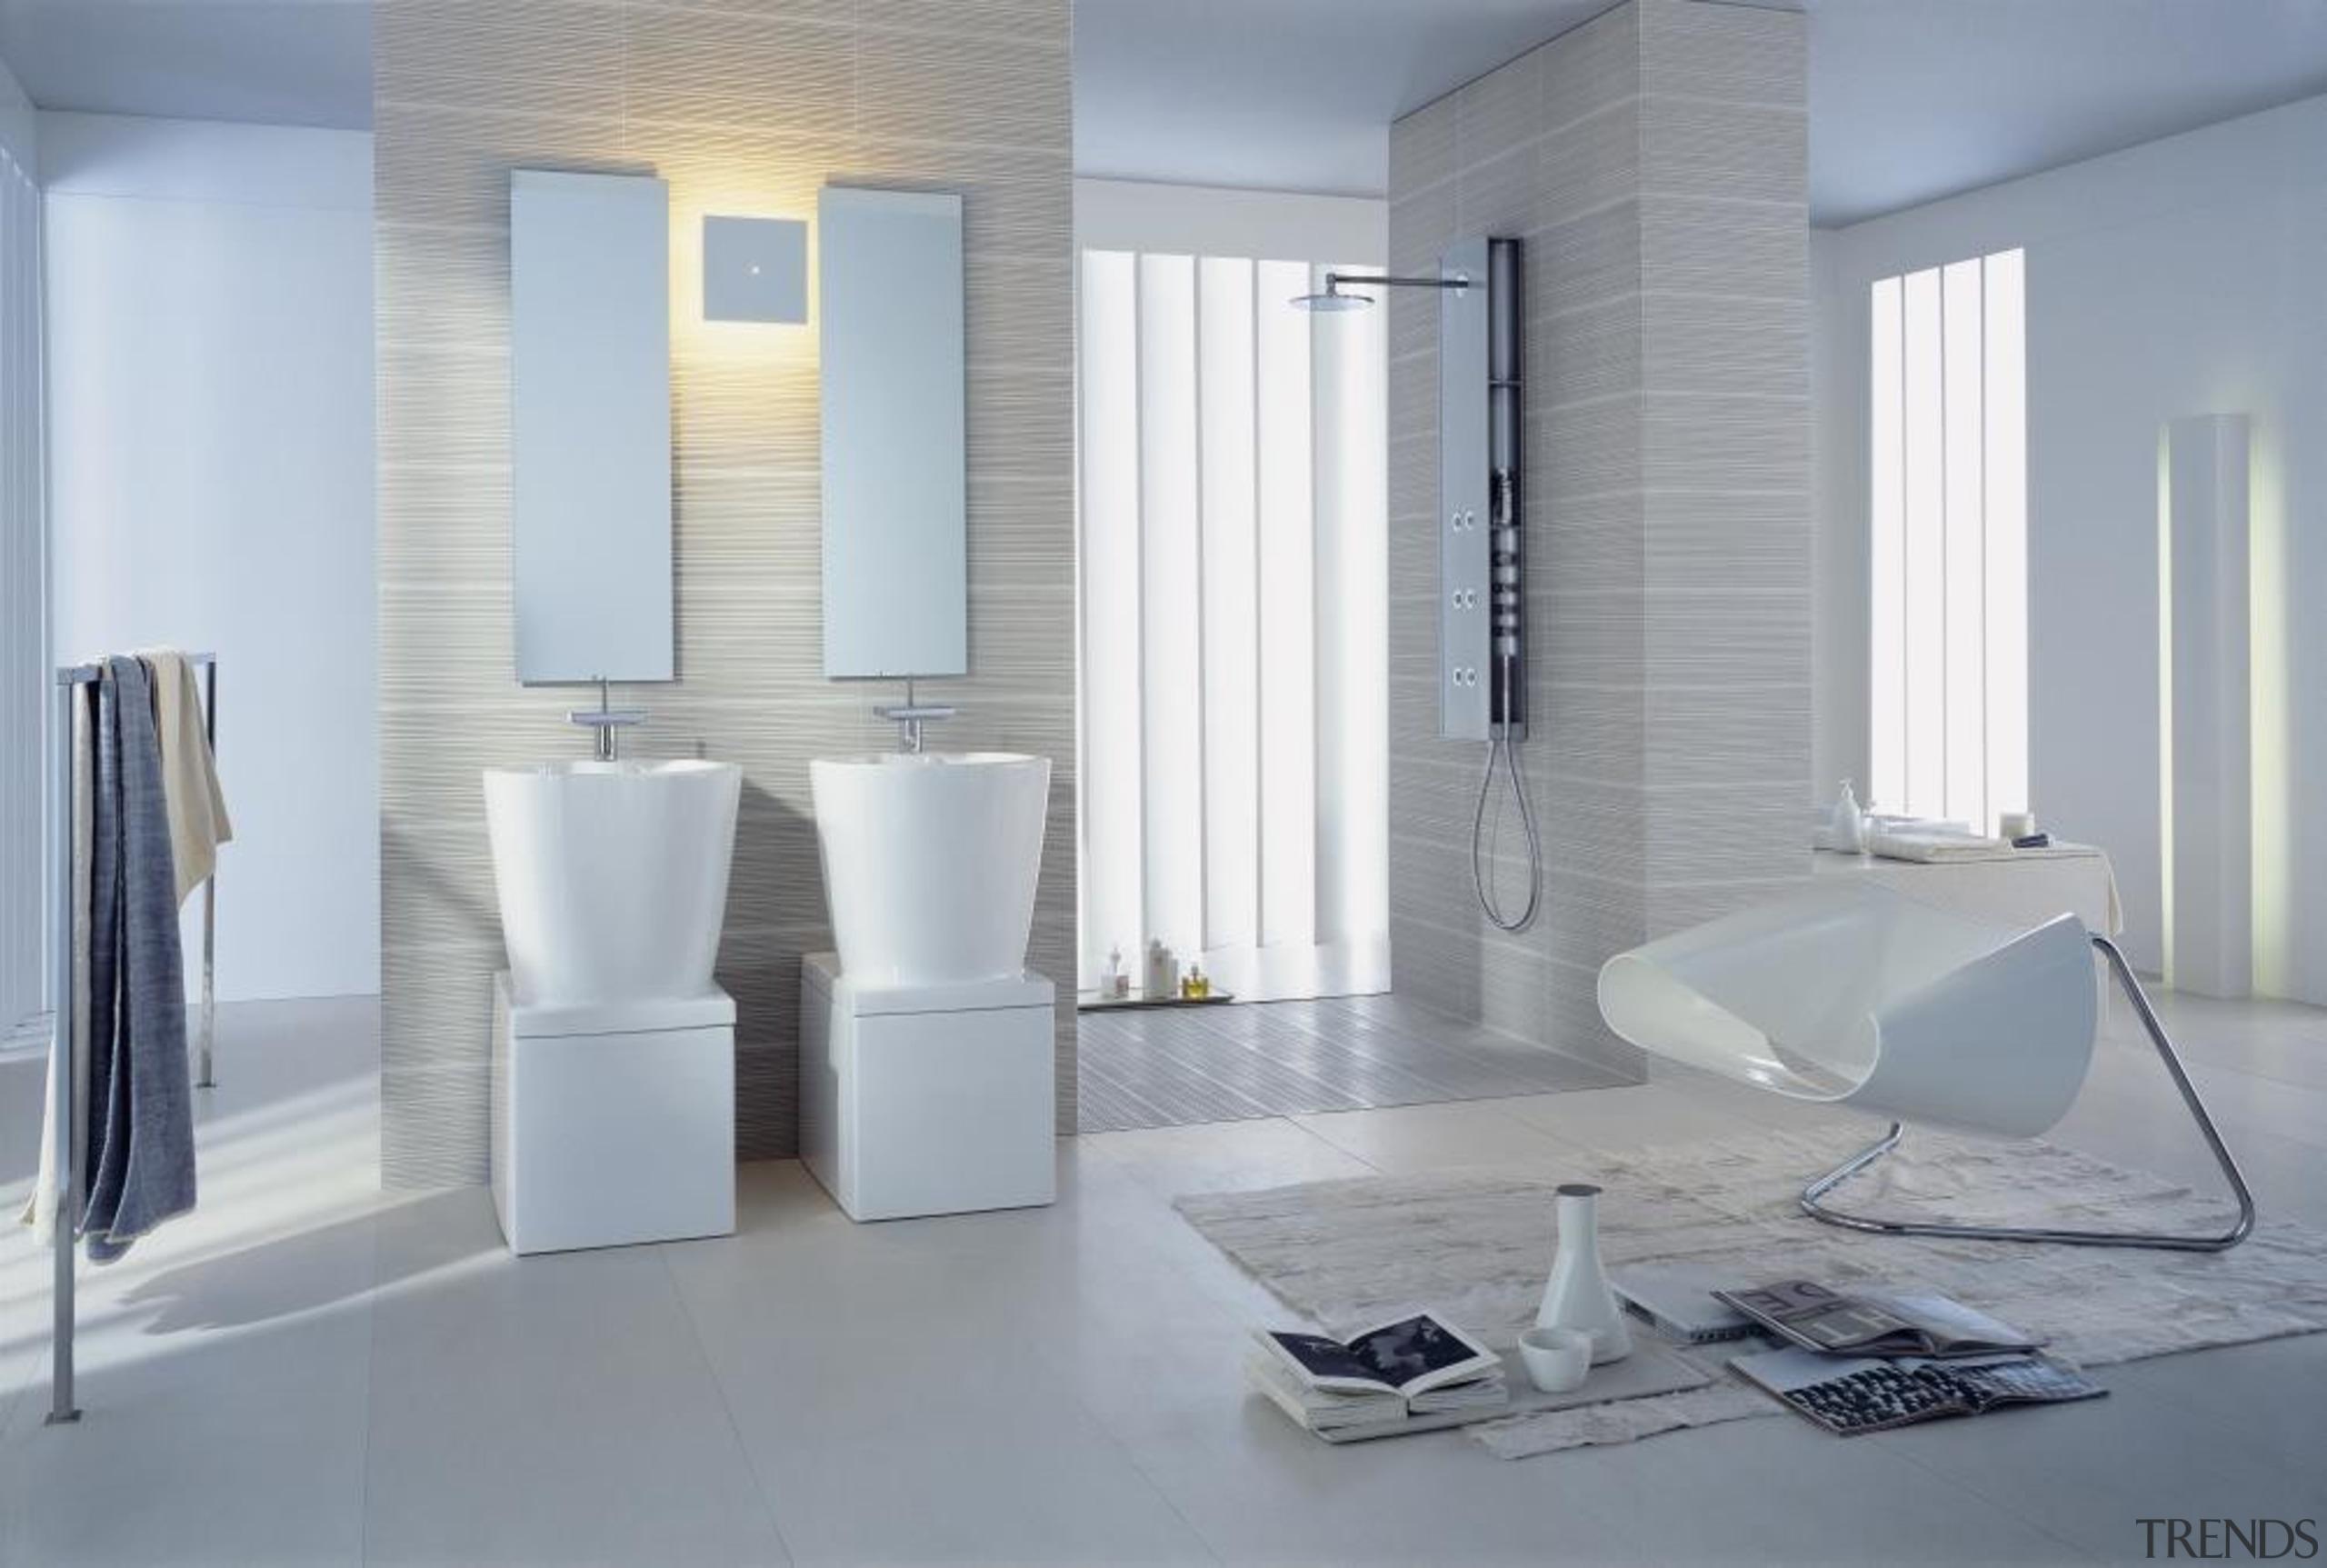 67759768814096282271002x675.jpg - 67759768814096282271002x675.jpg - bathroom | floor | bathroom, floor, flooring, interior design, plumbing fixture, product design, tap, tile, gray